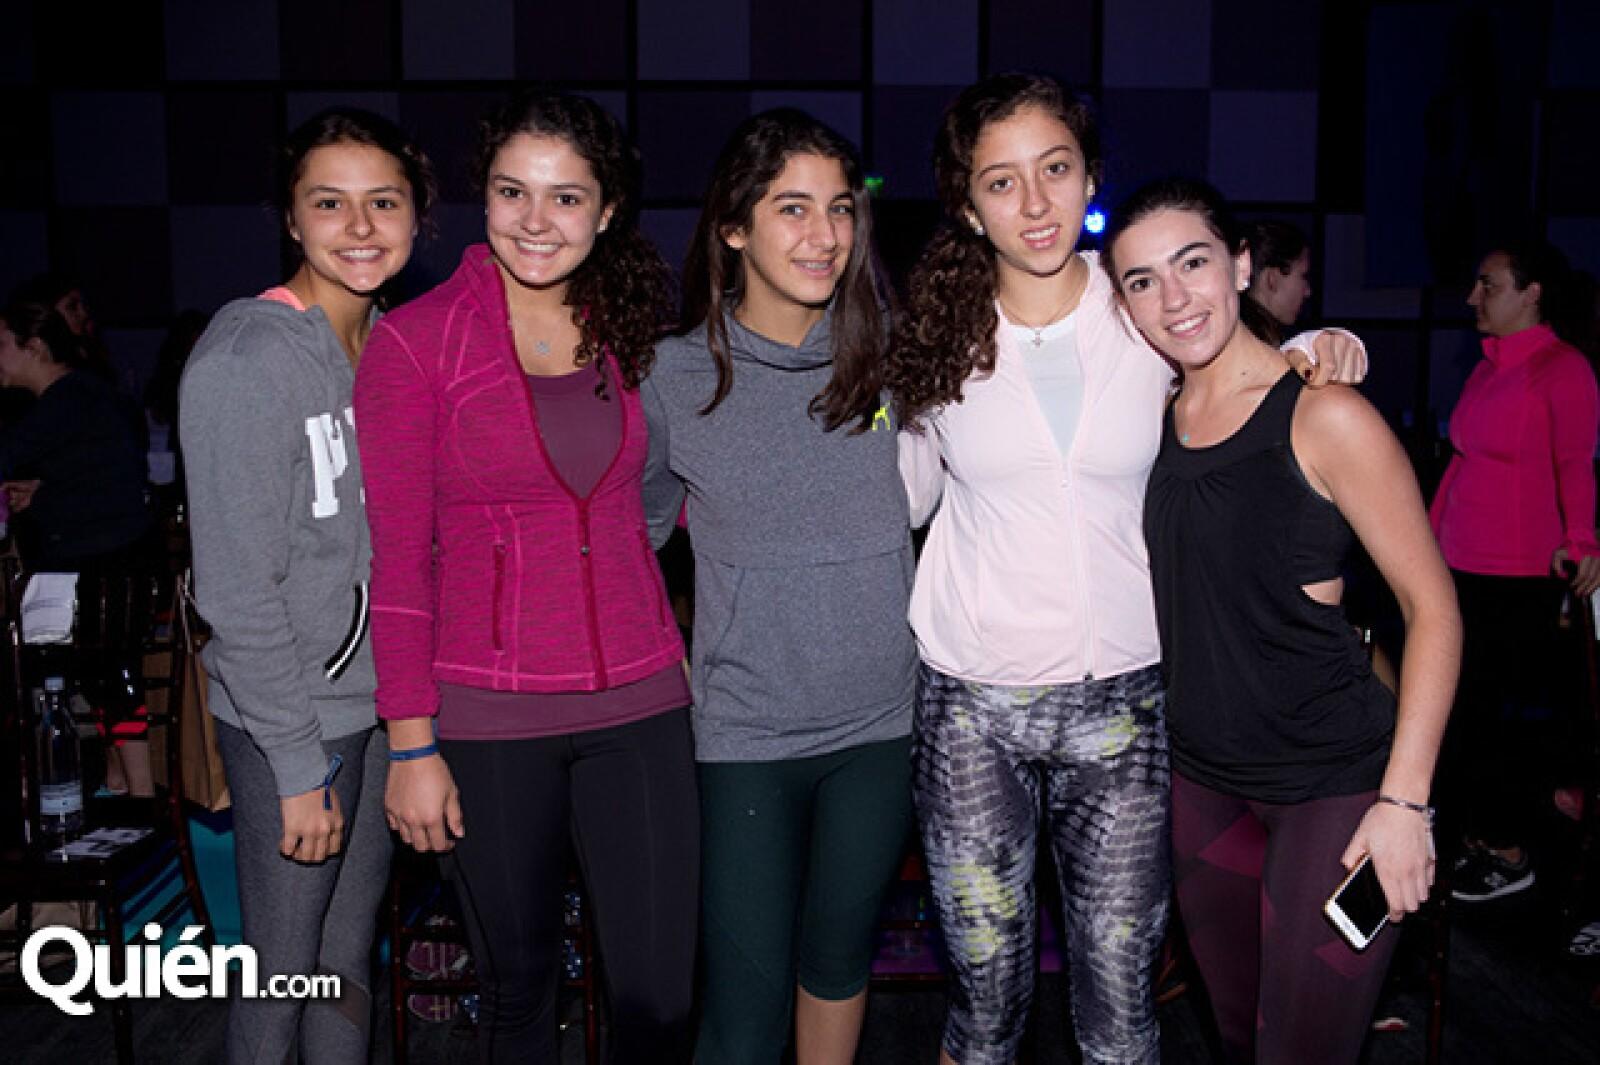 Natalia Van, Ximena Van, Ileana Neme, Valeria Sli y Covadonga Gallego